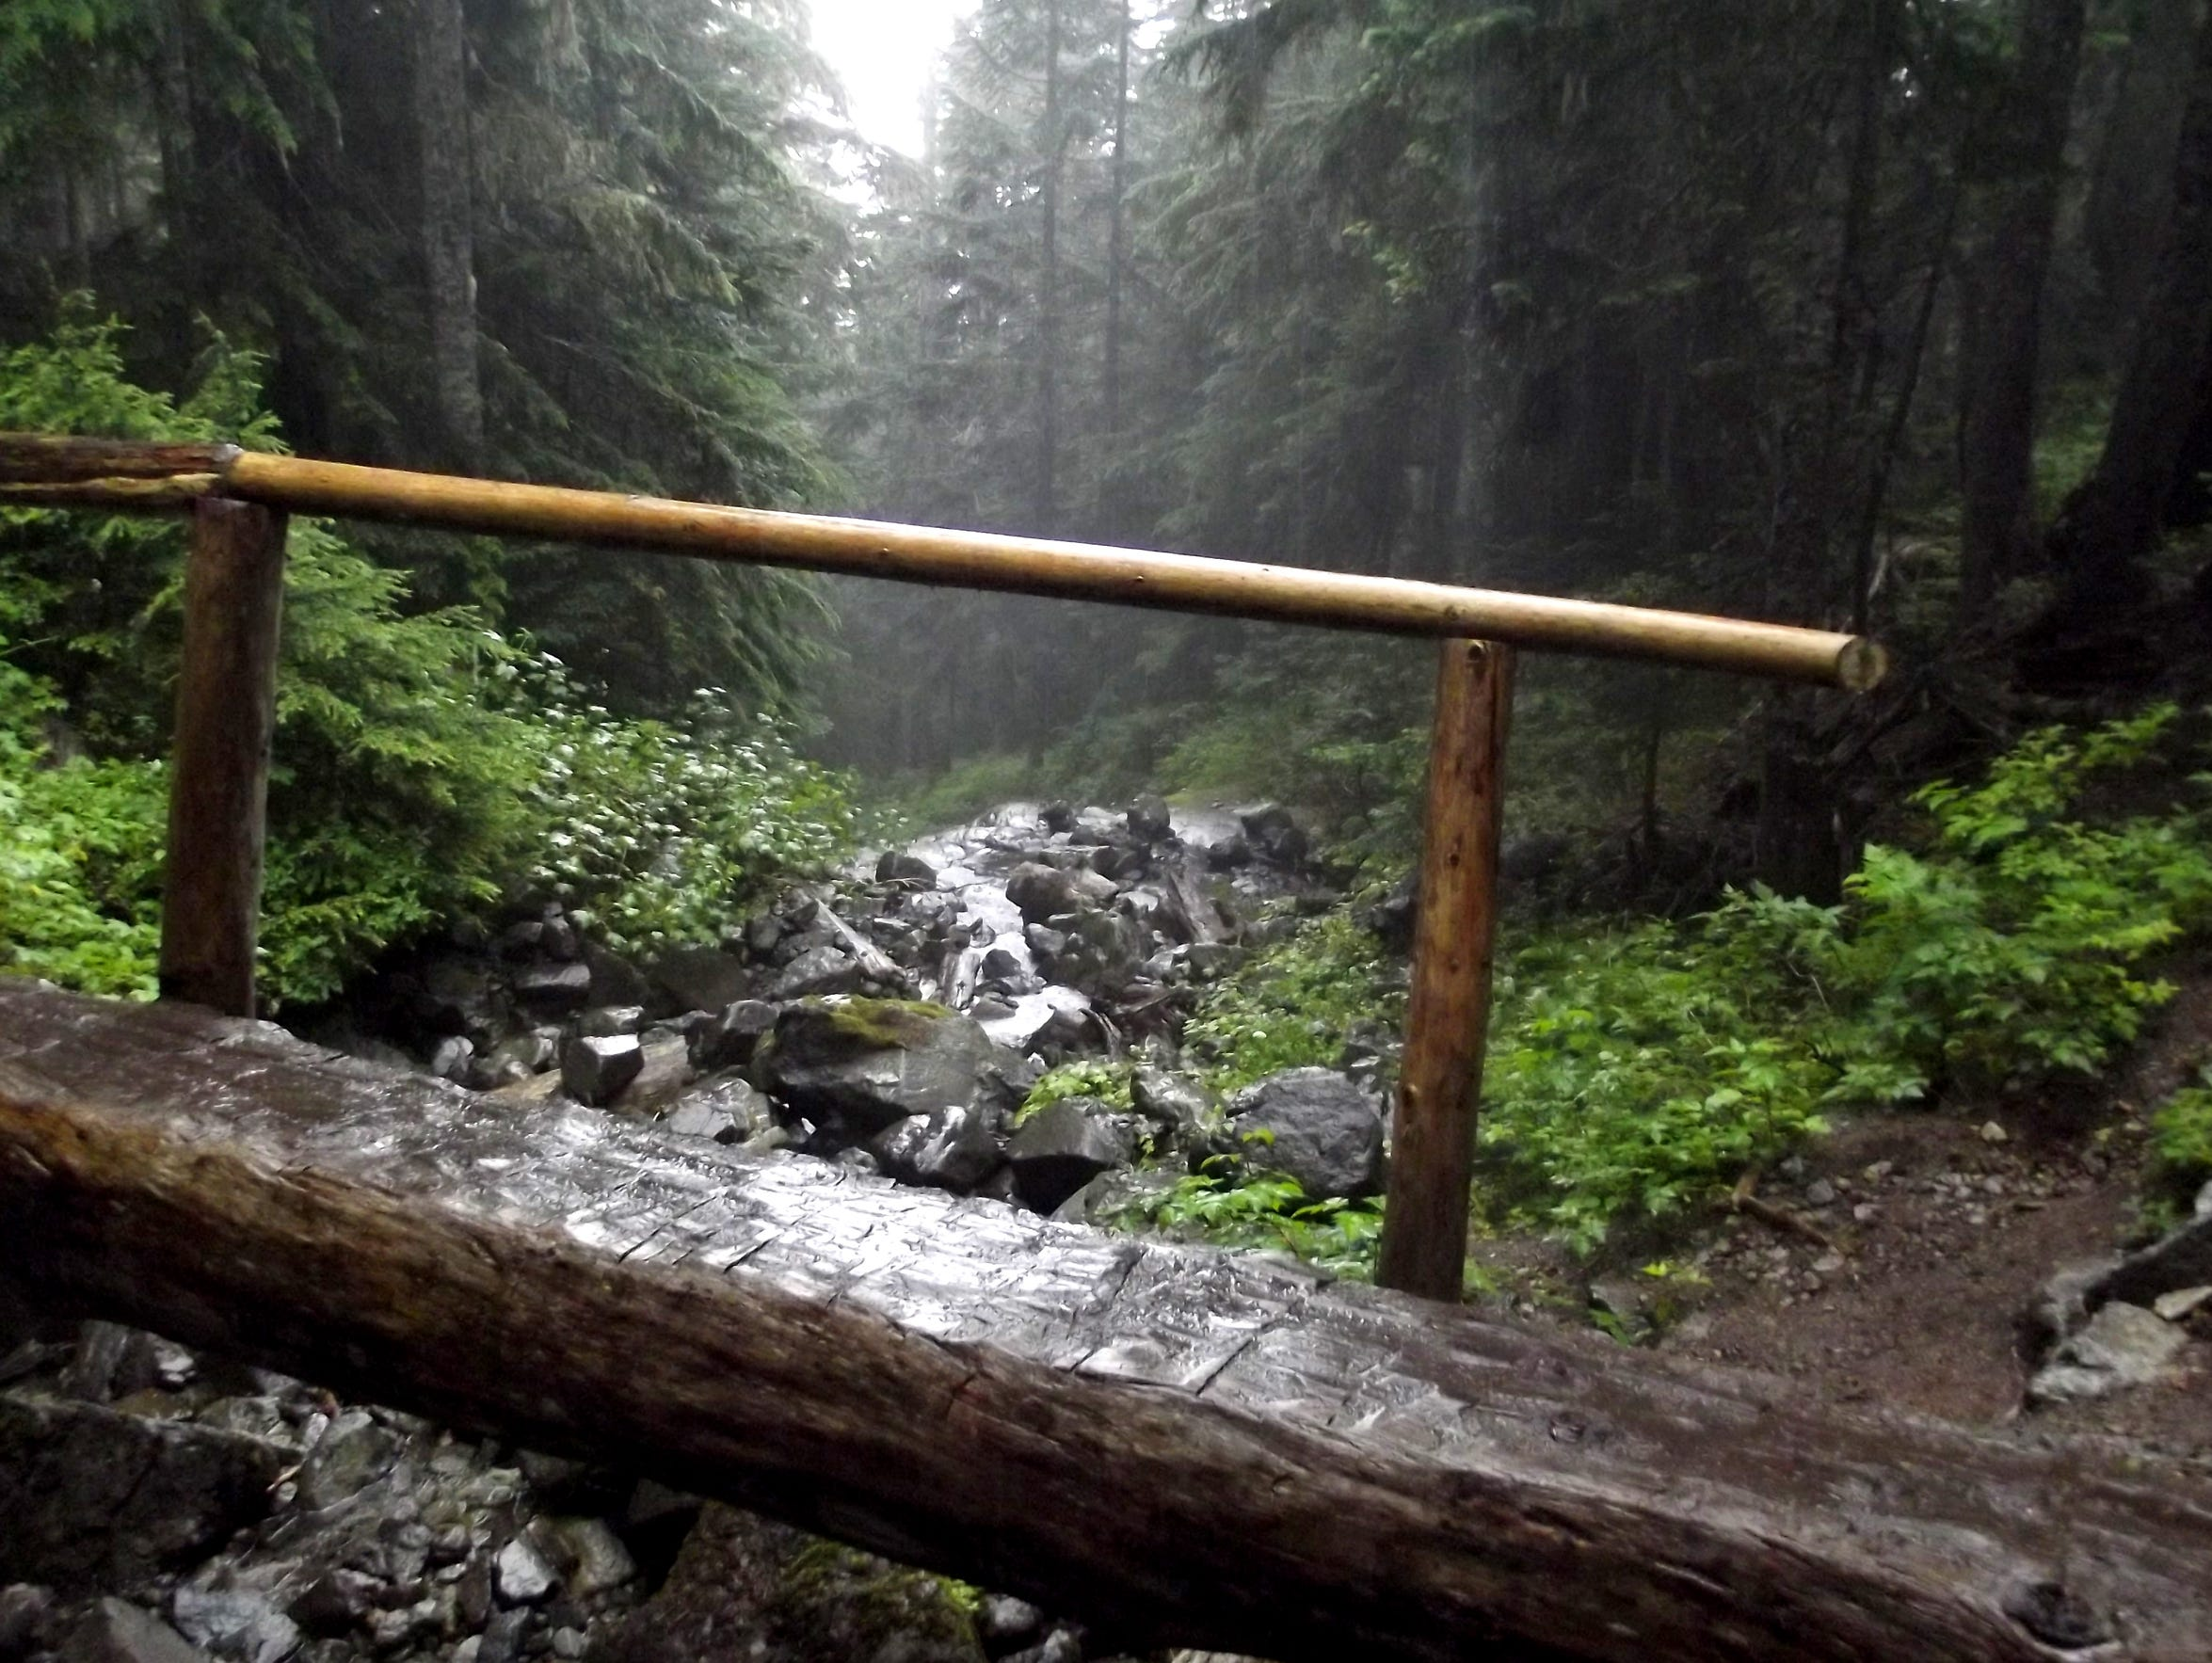 A photo from a trail near the base of Mt. Rainier.